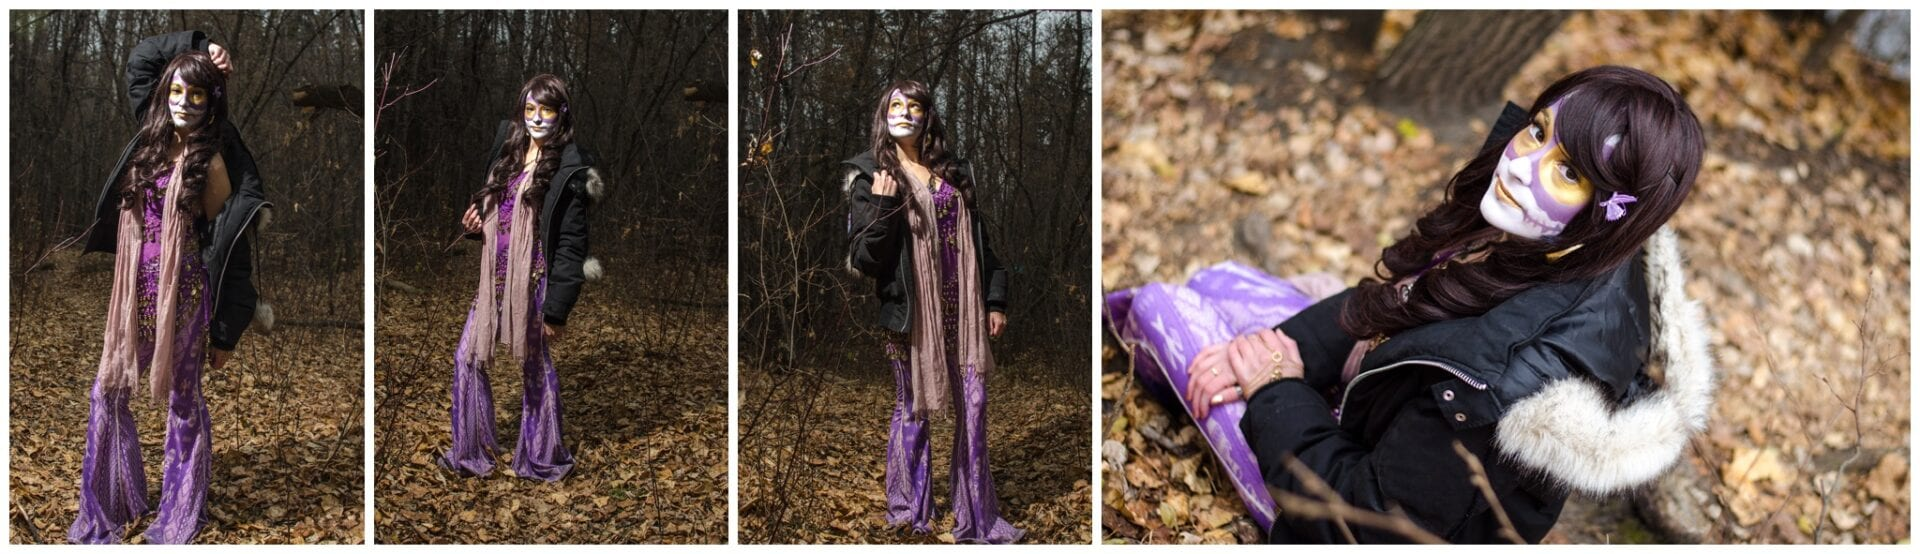 Fall-Woods-errie-fashion000